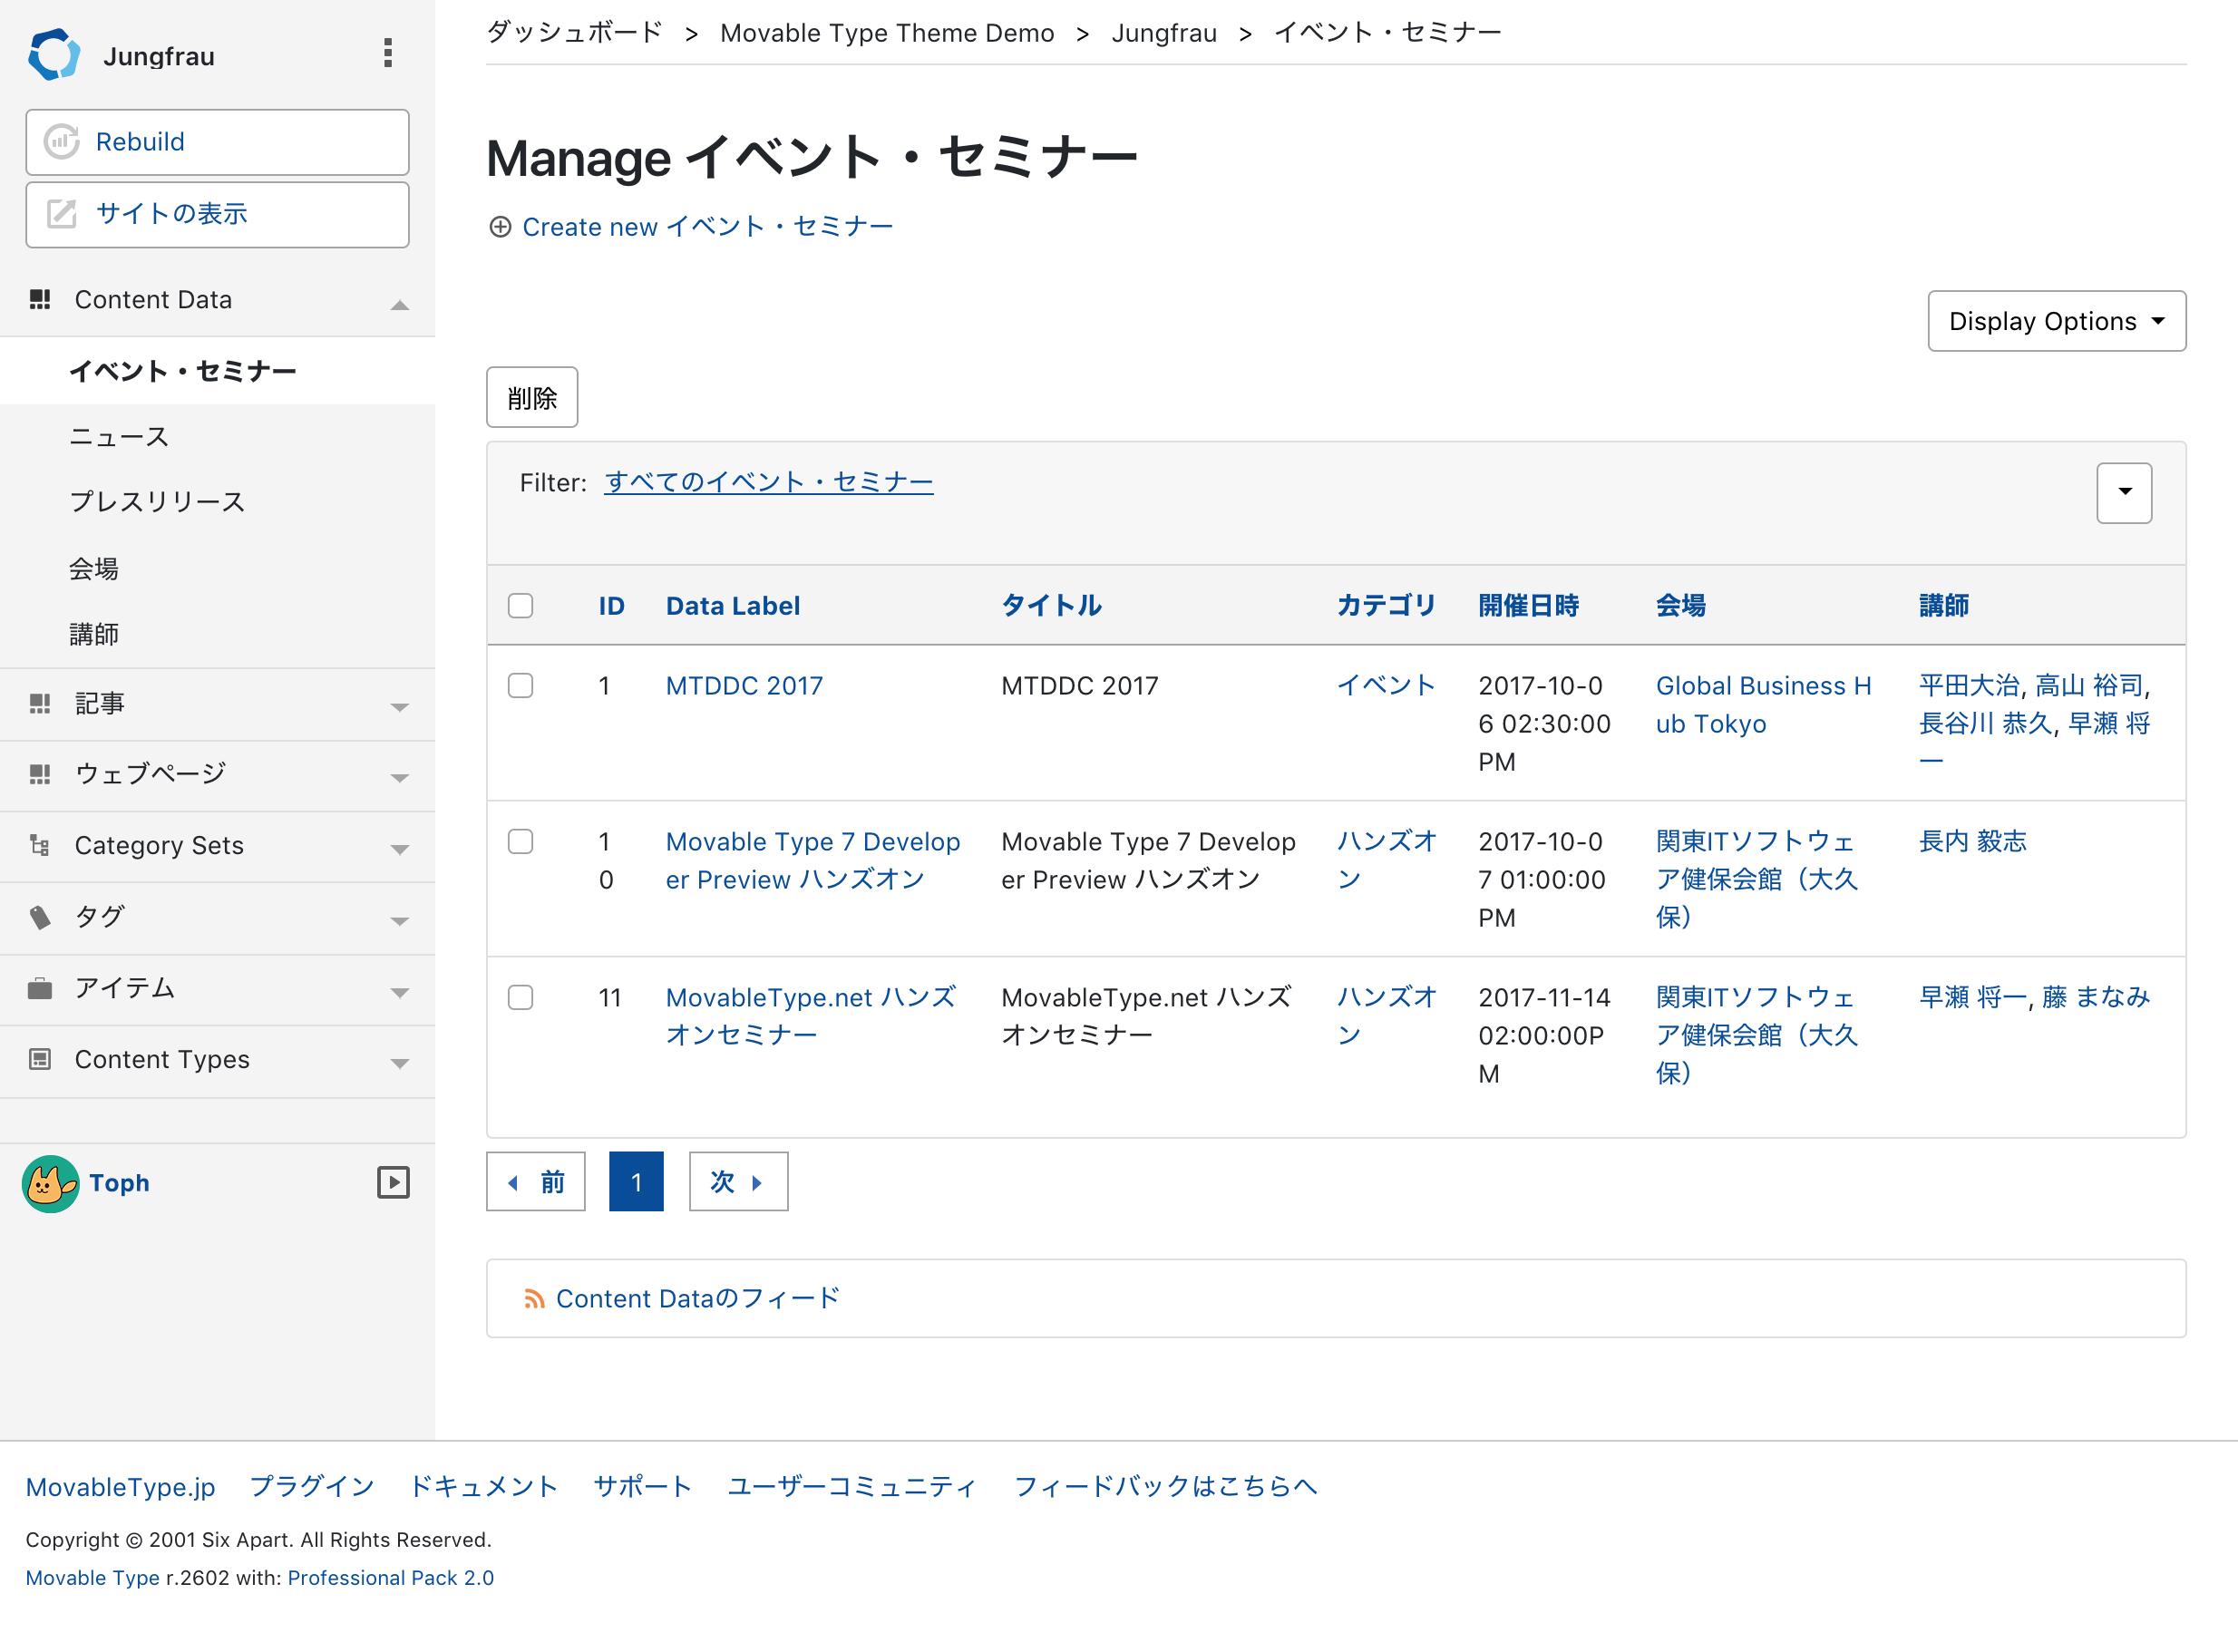 Movable Type 7 ベータ版 イベントコンテンツ一覧画面